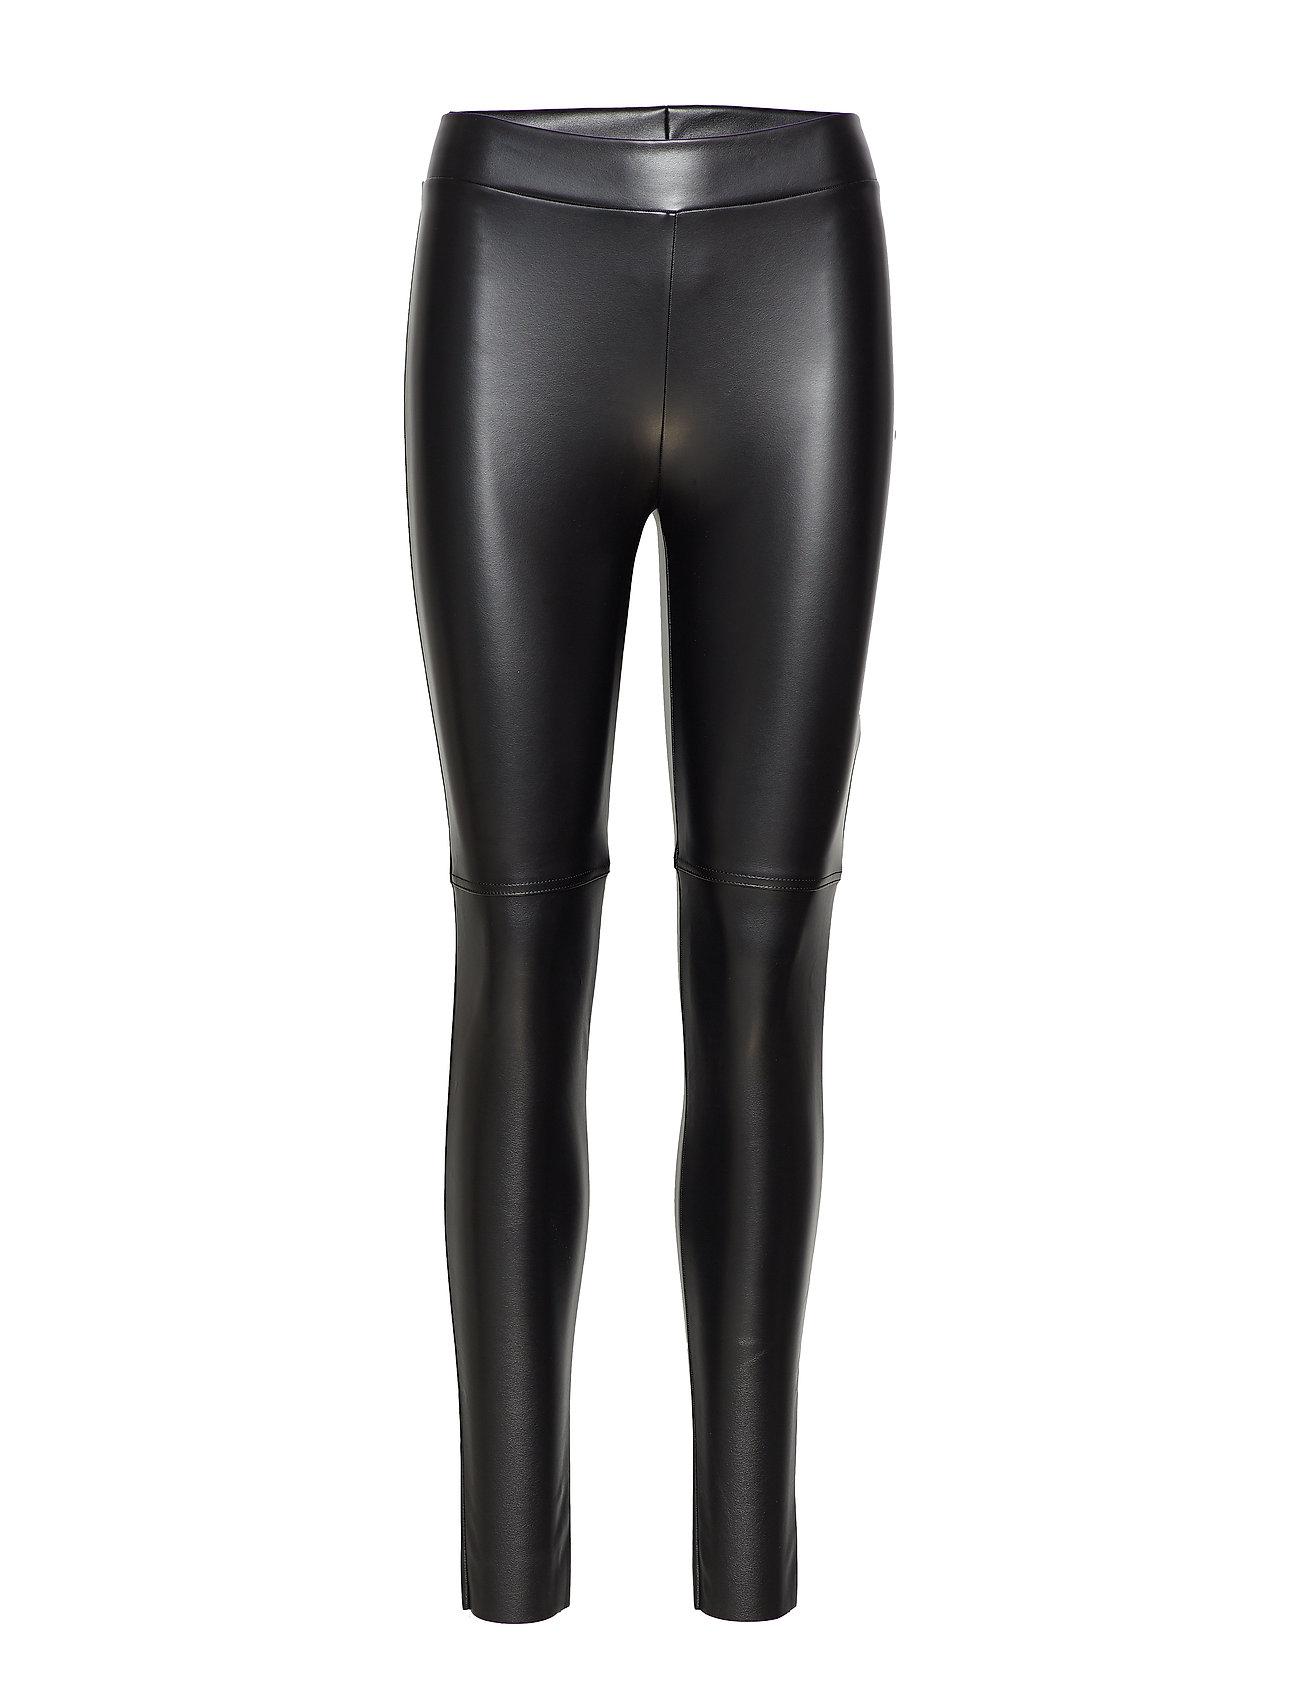 Image of Estella Leggings Leather Leggings/Bukser Sort Wolford (2980992859)